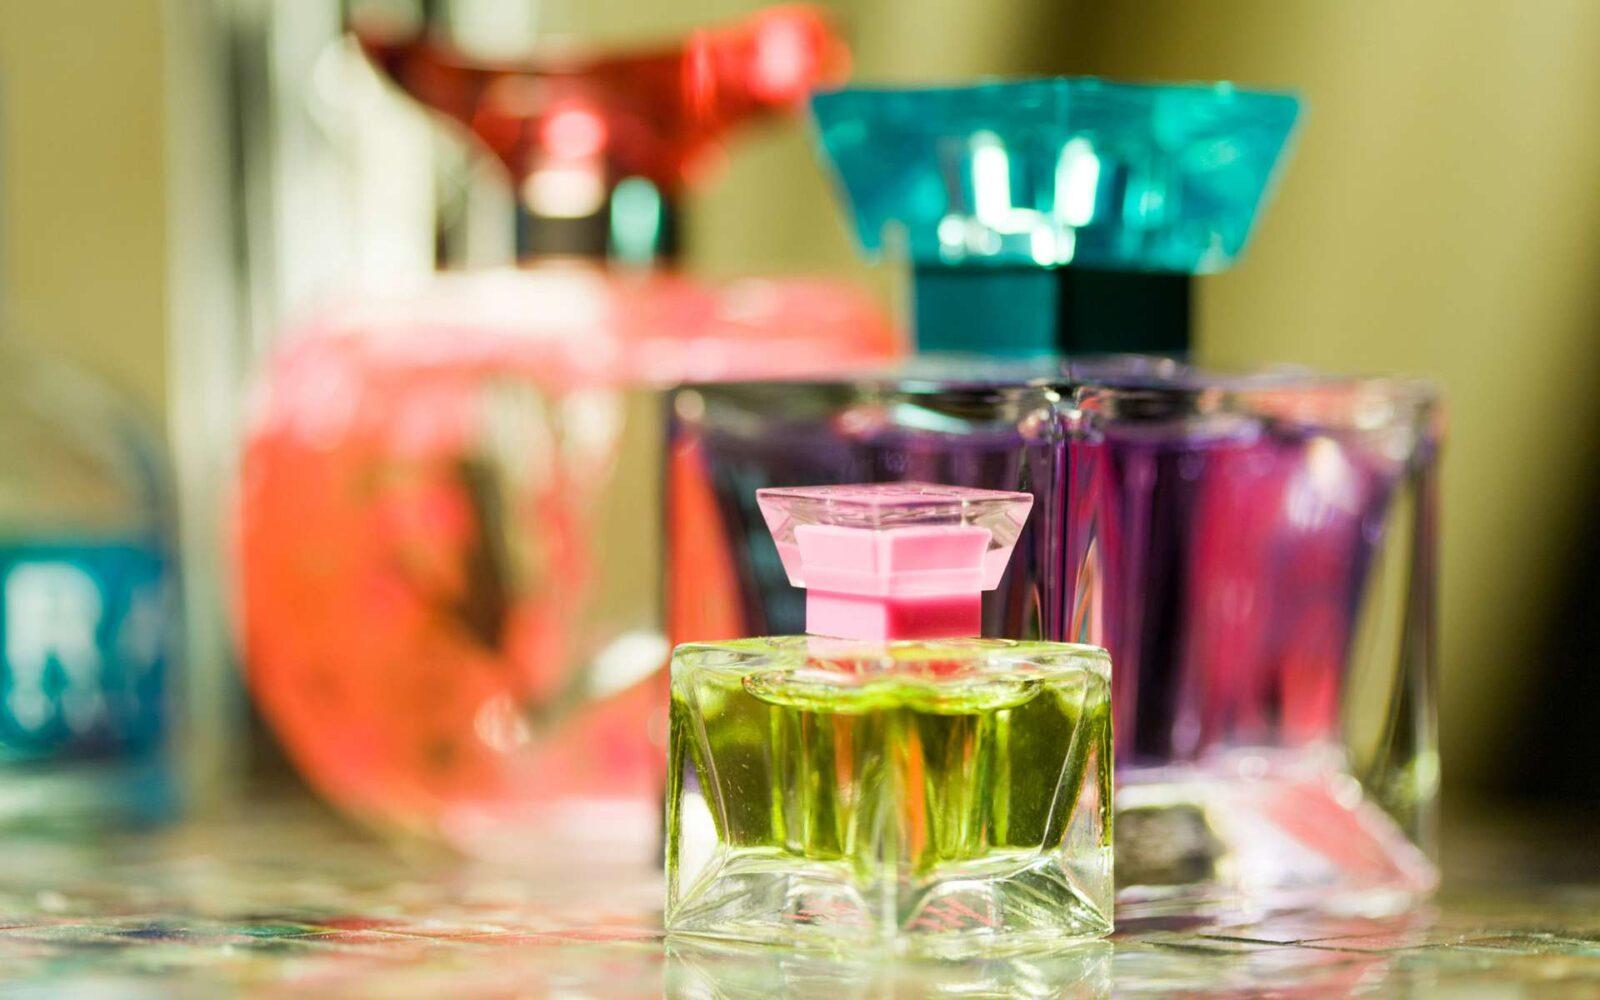 Таможенники Узбекистана пресекли контрабанду парфюмерии на 4 миллиарда сум